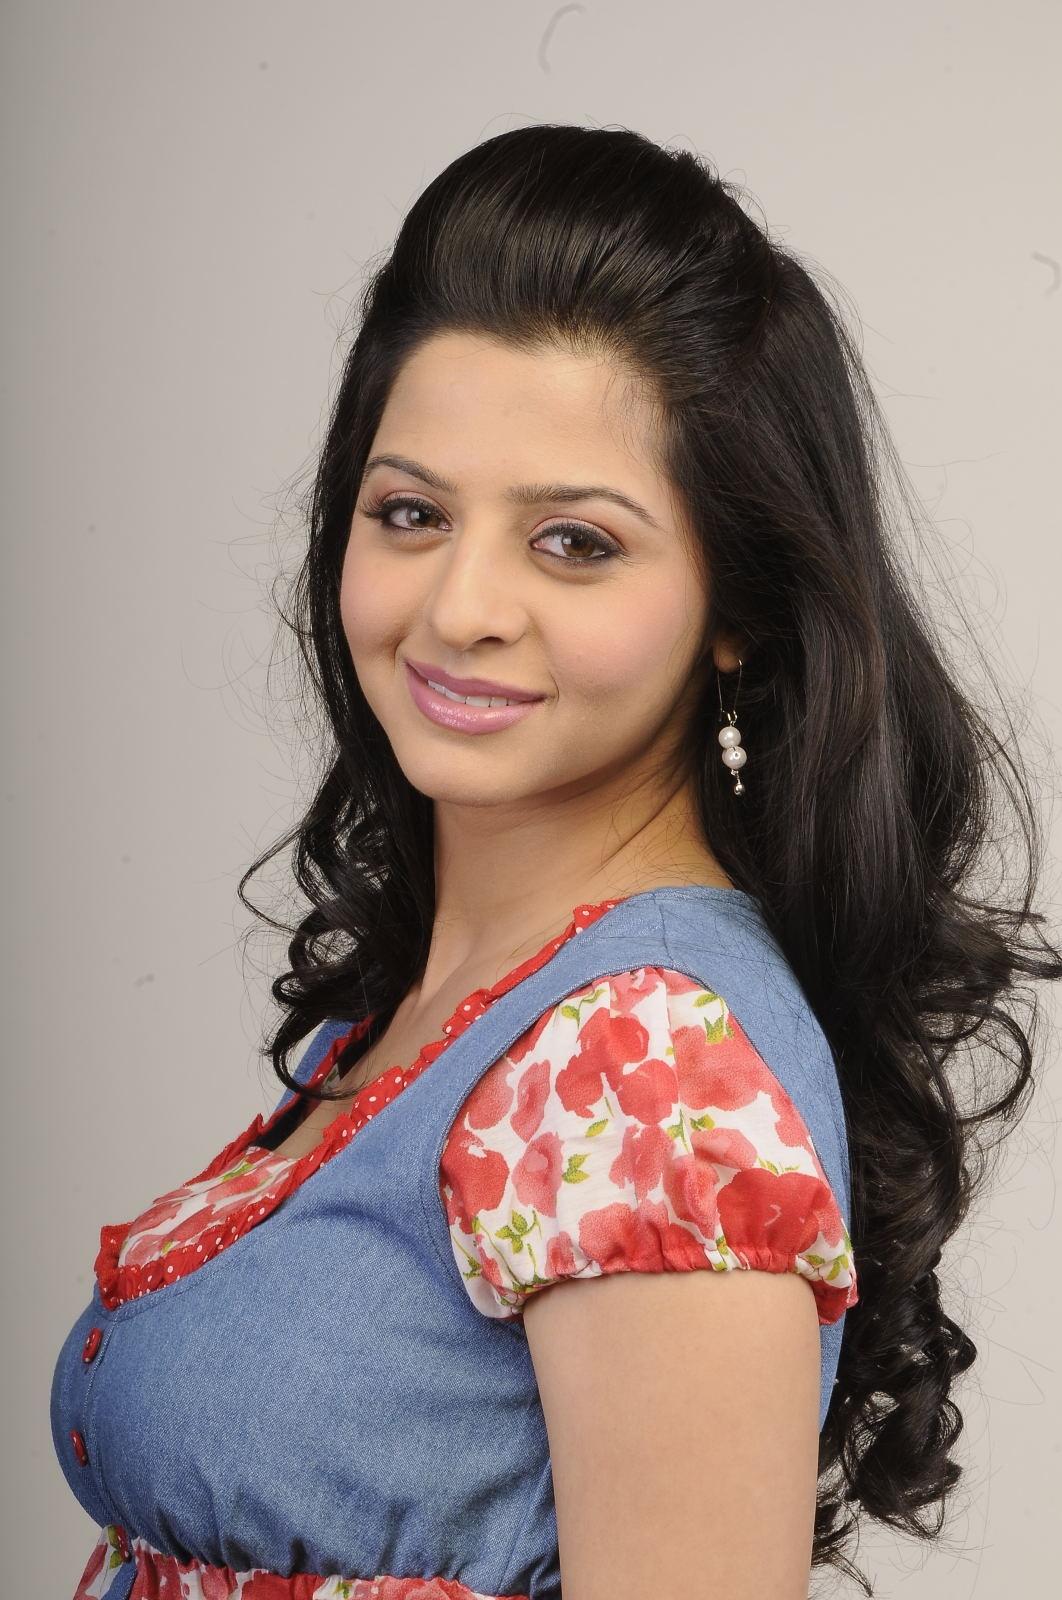 22 tamil hot girl bj big cock and fuck 10